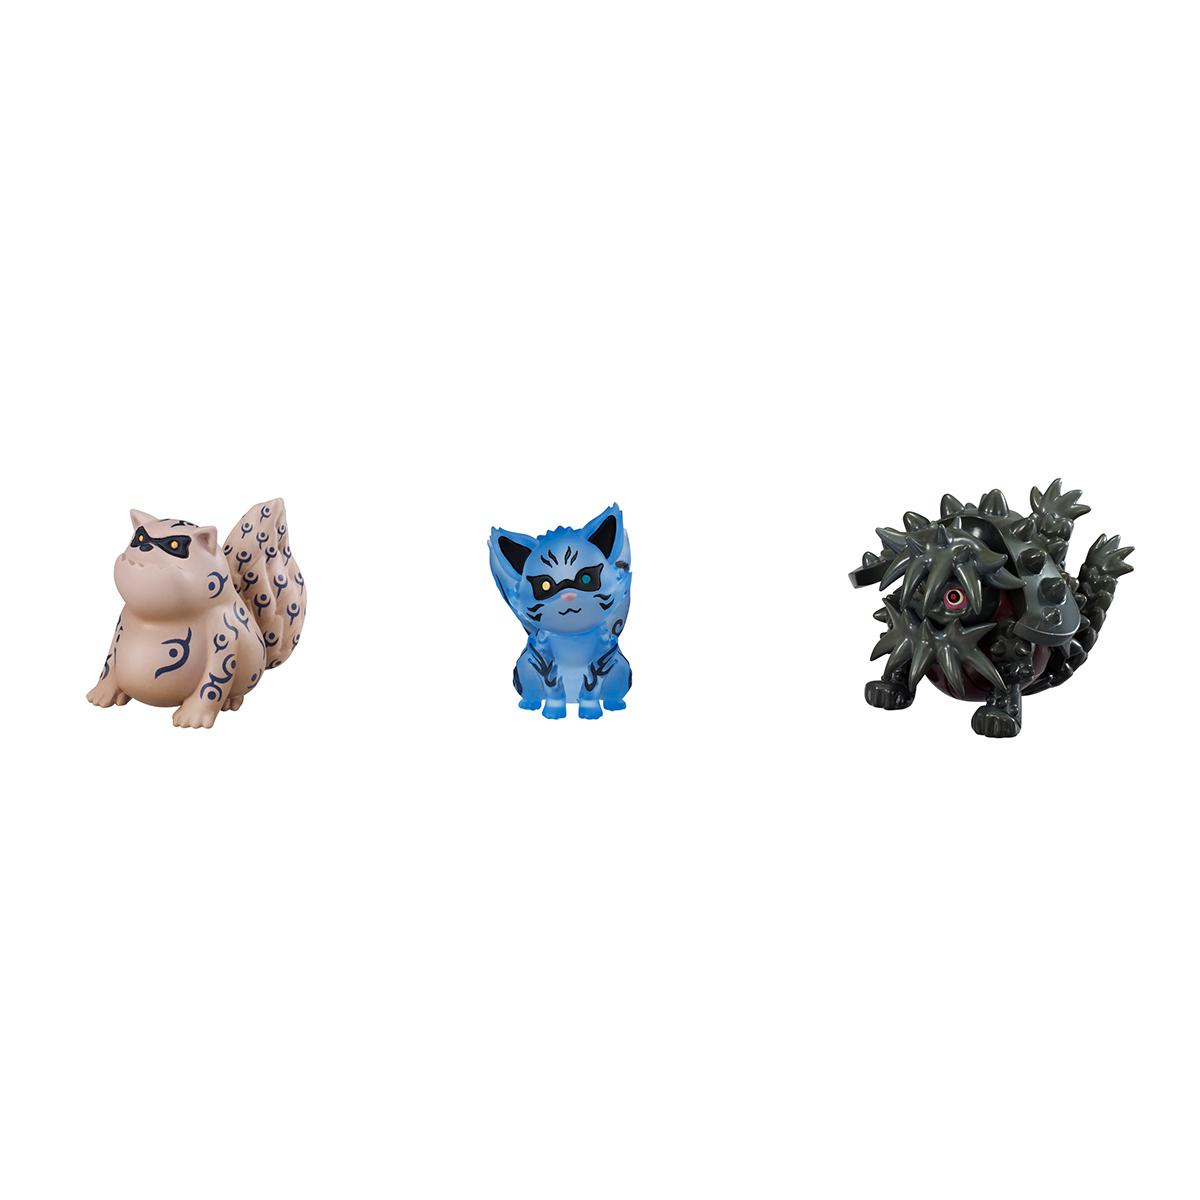 Naruto and Tailed Beasts Naruto Figure Set